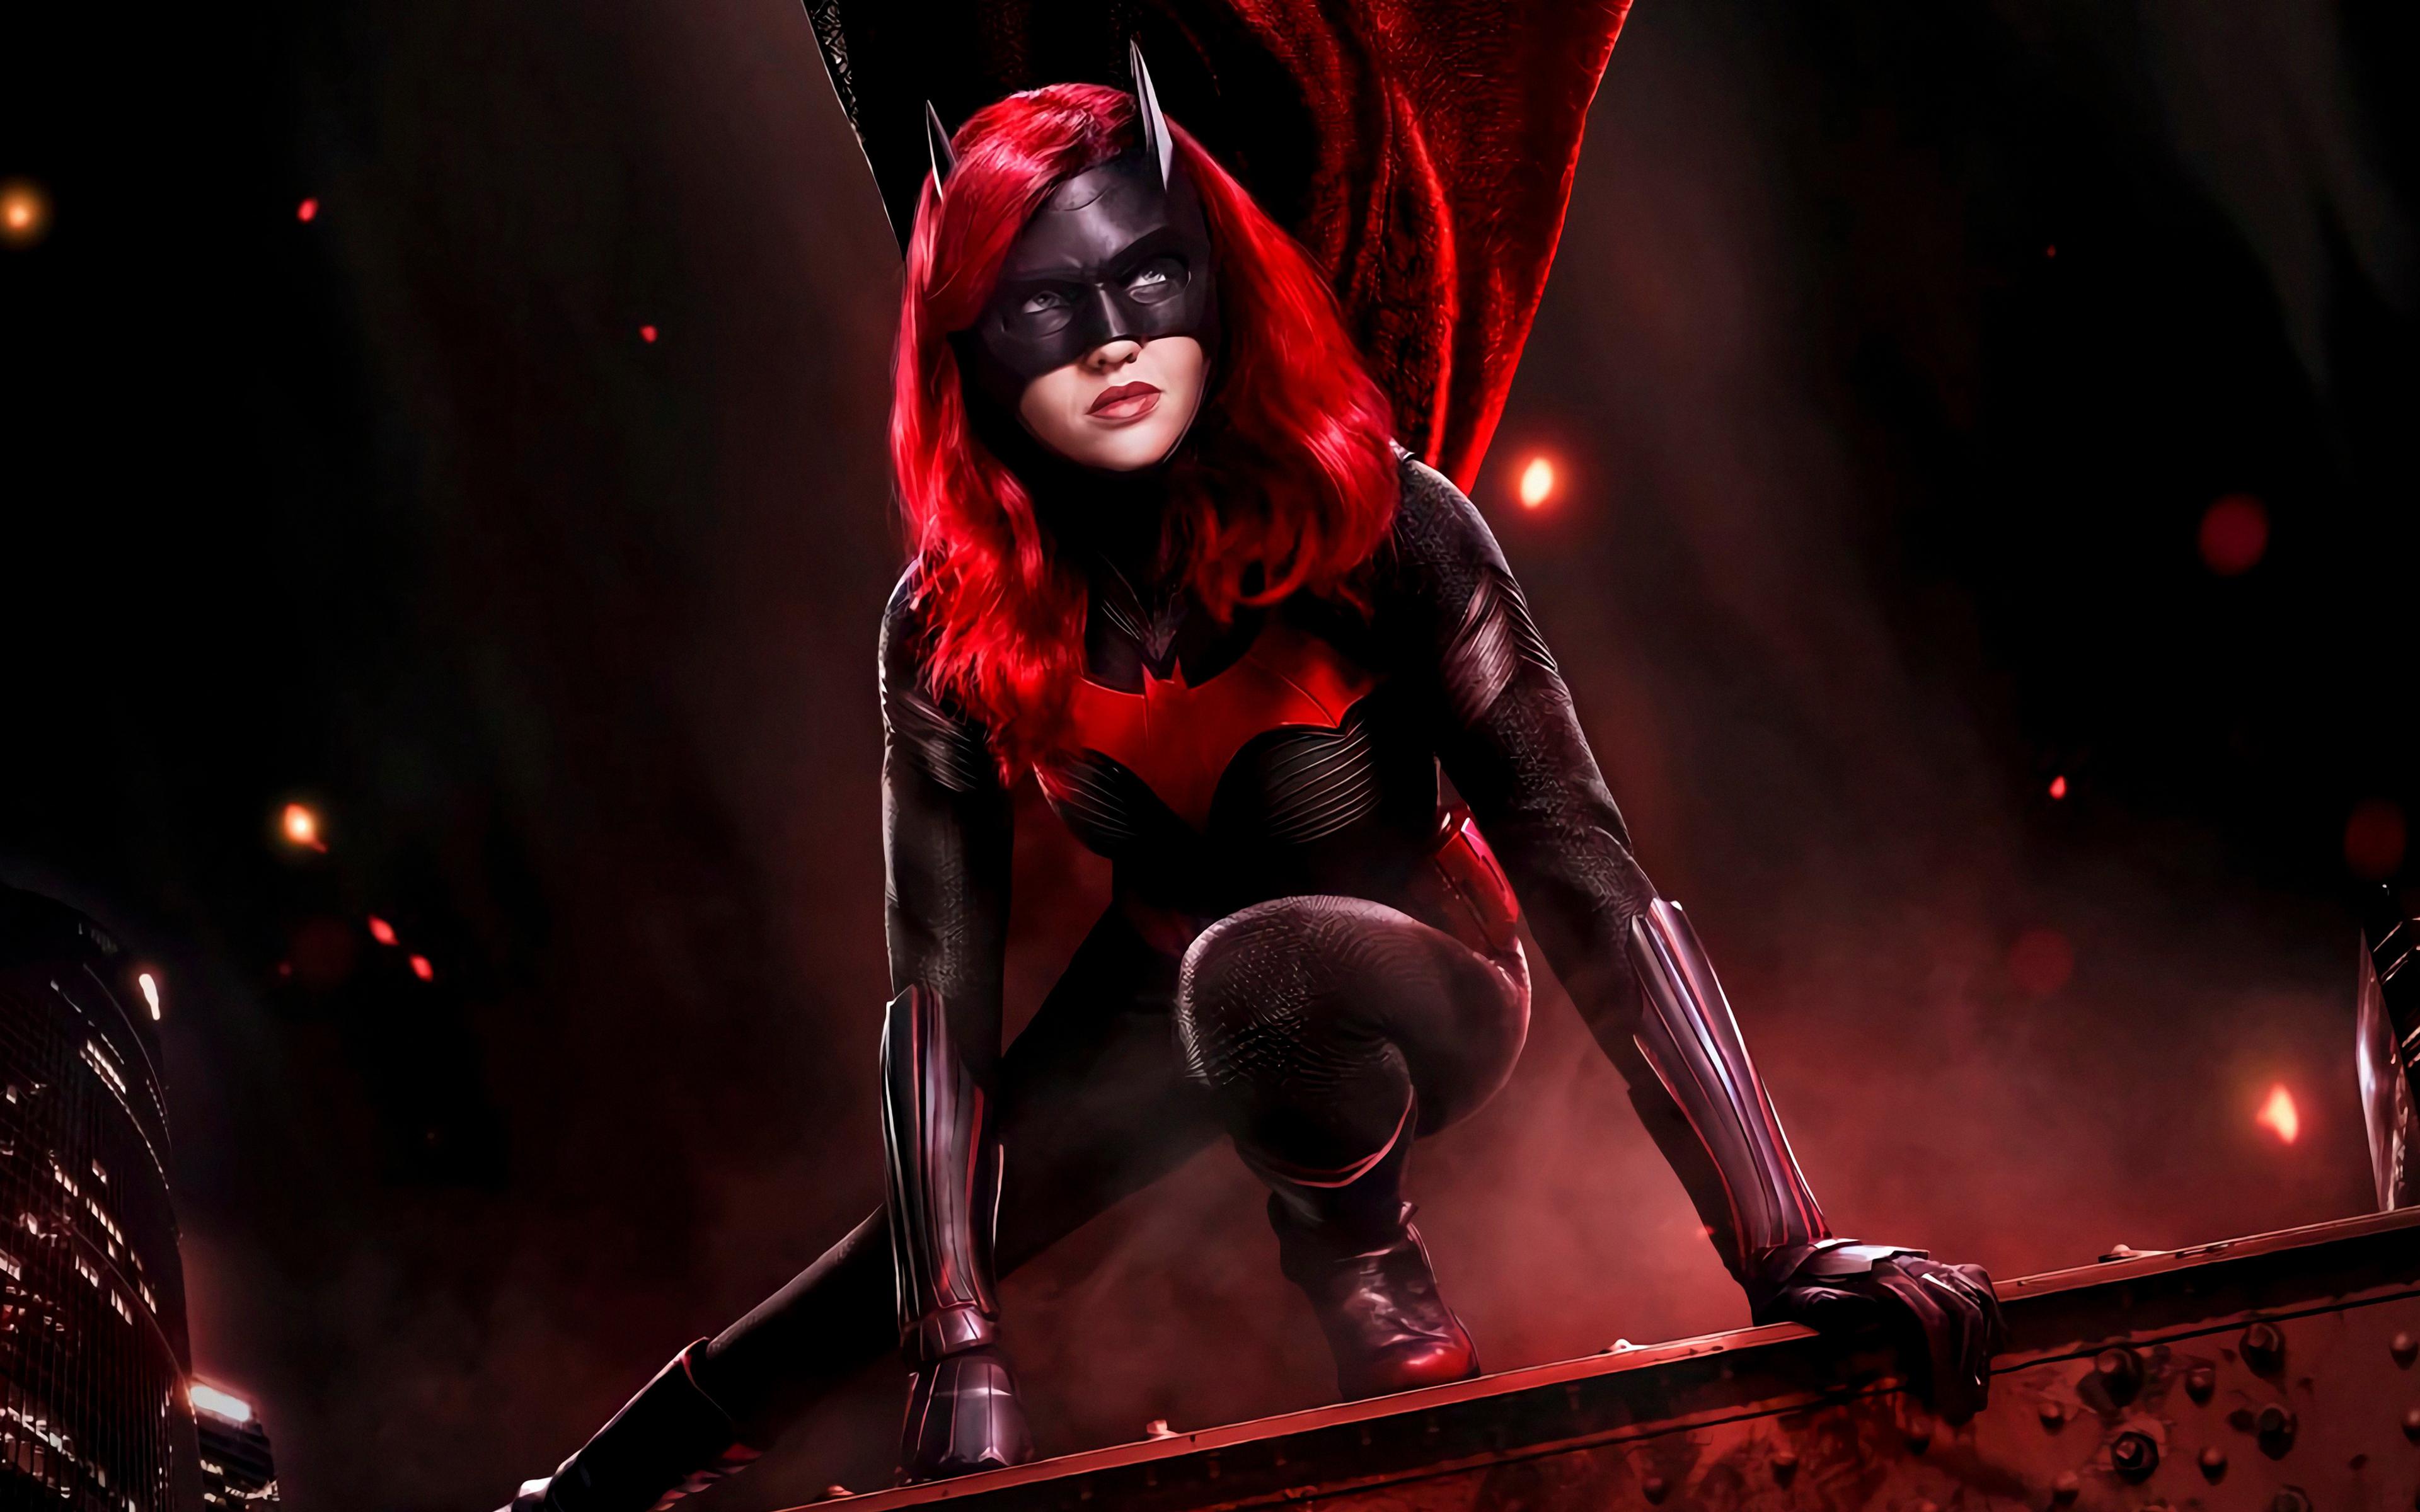 batwoman-4k-2019-l6.jpg